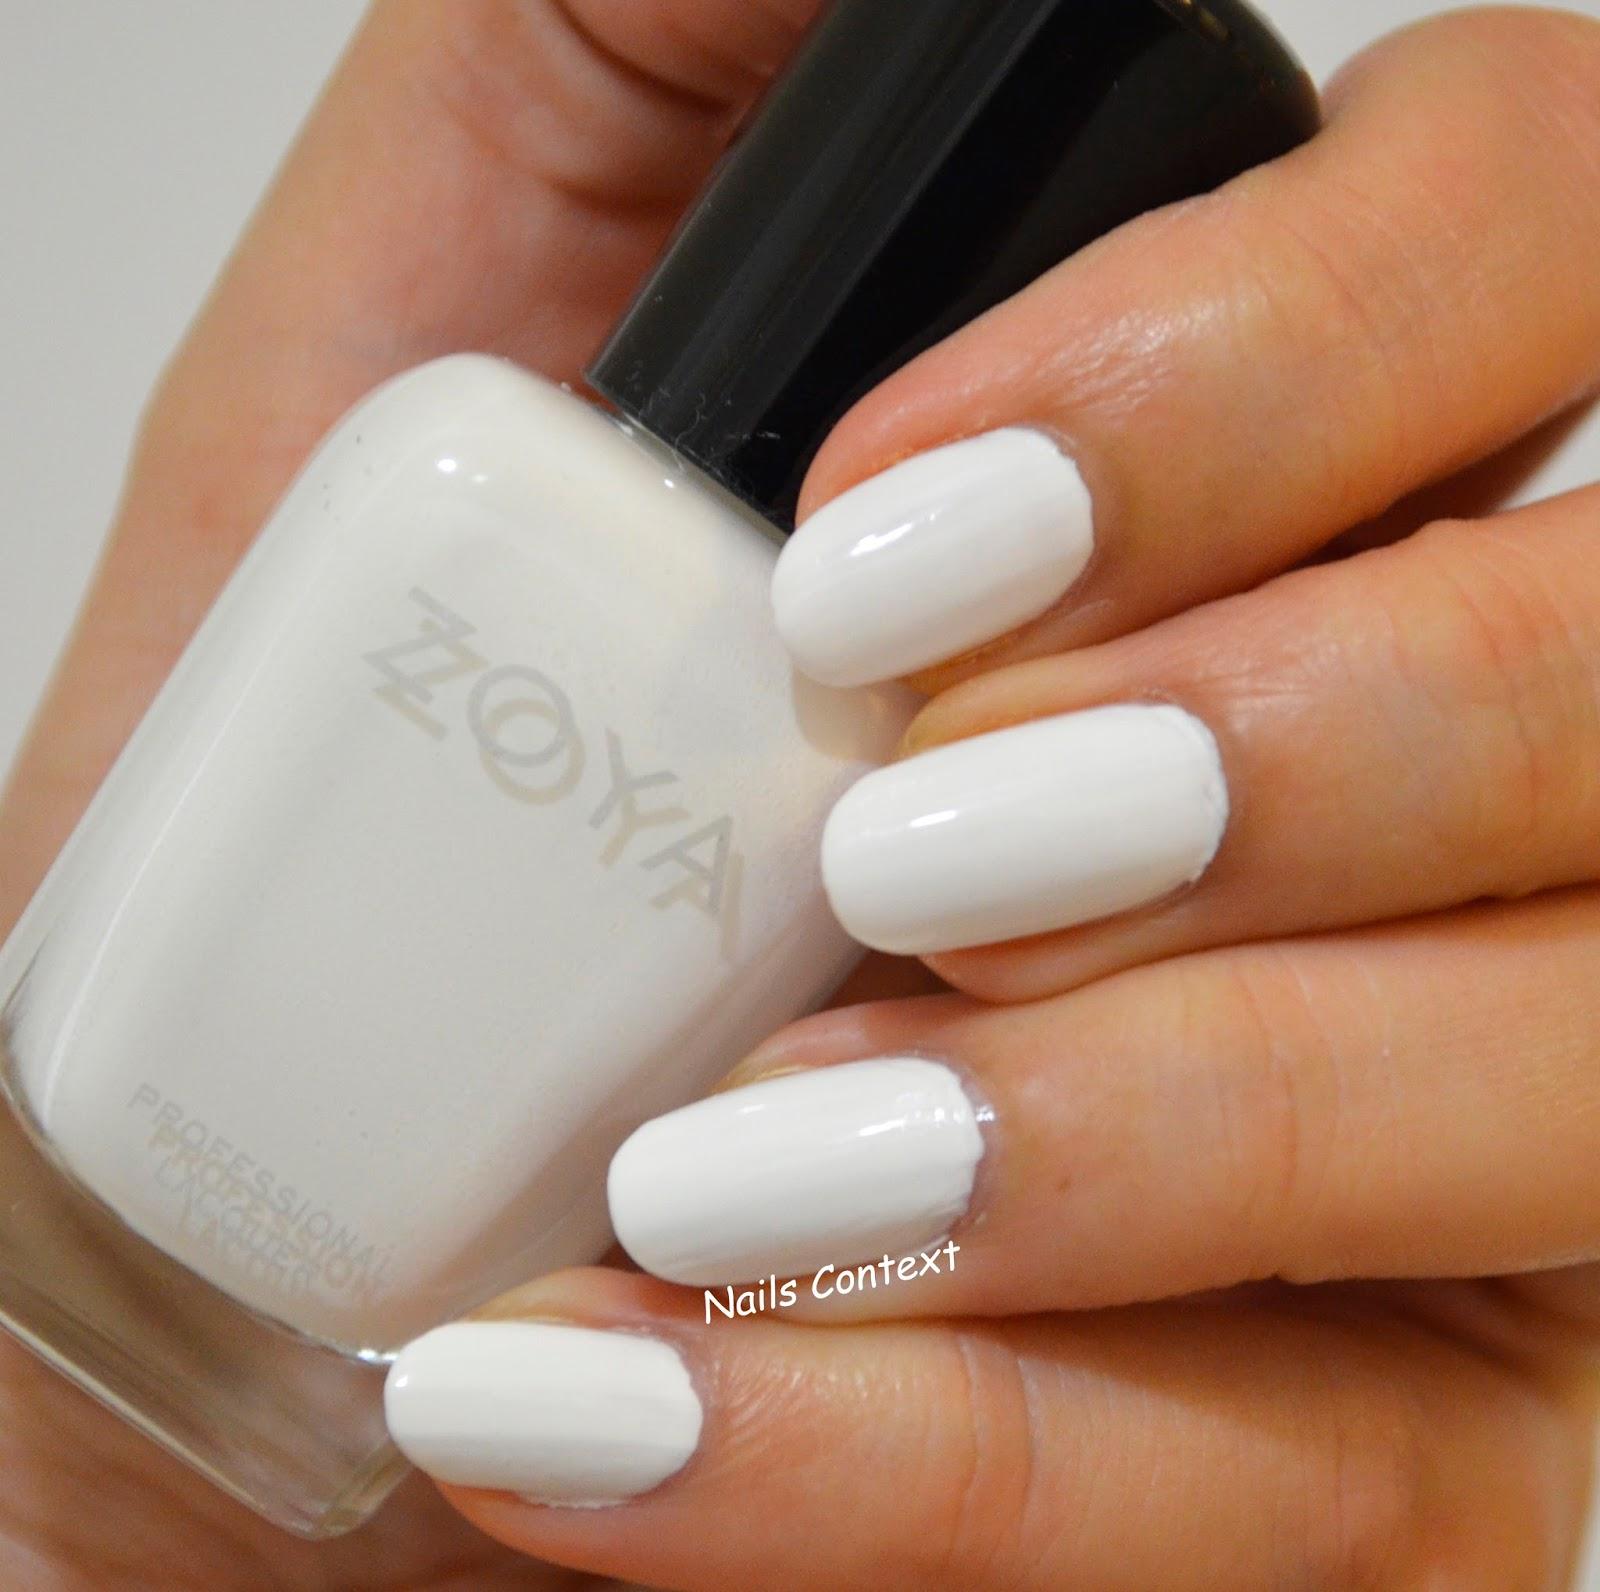 Nails Context: Zoya : Purity